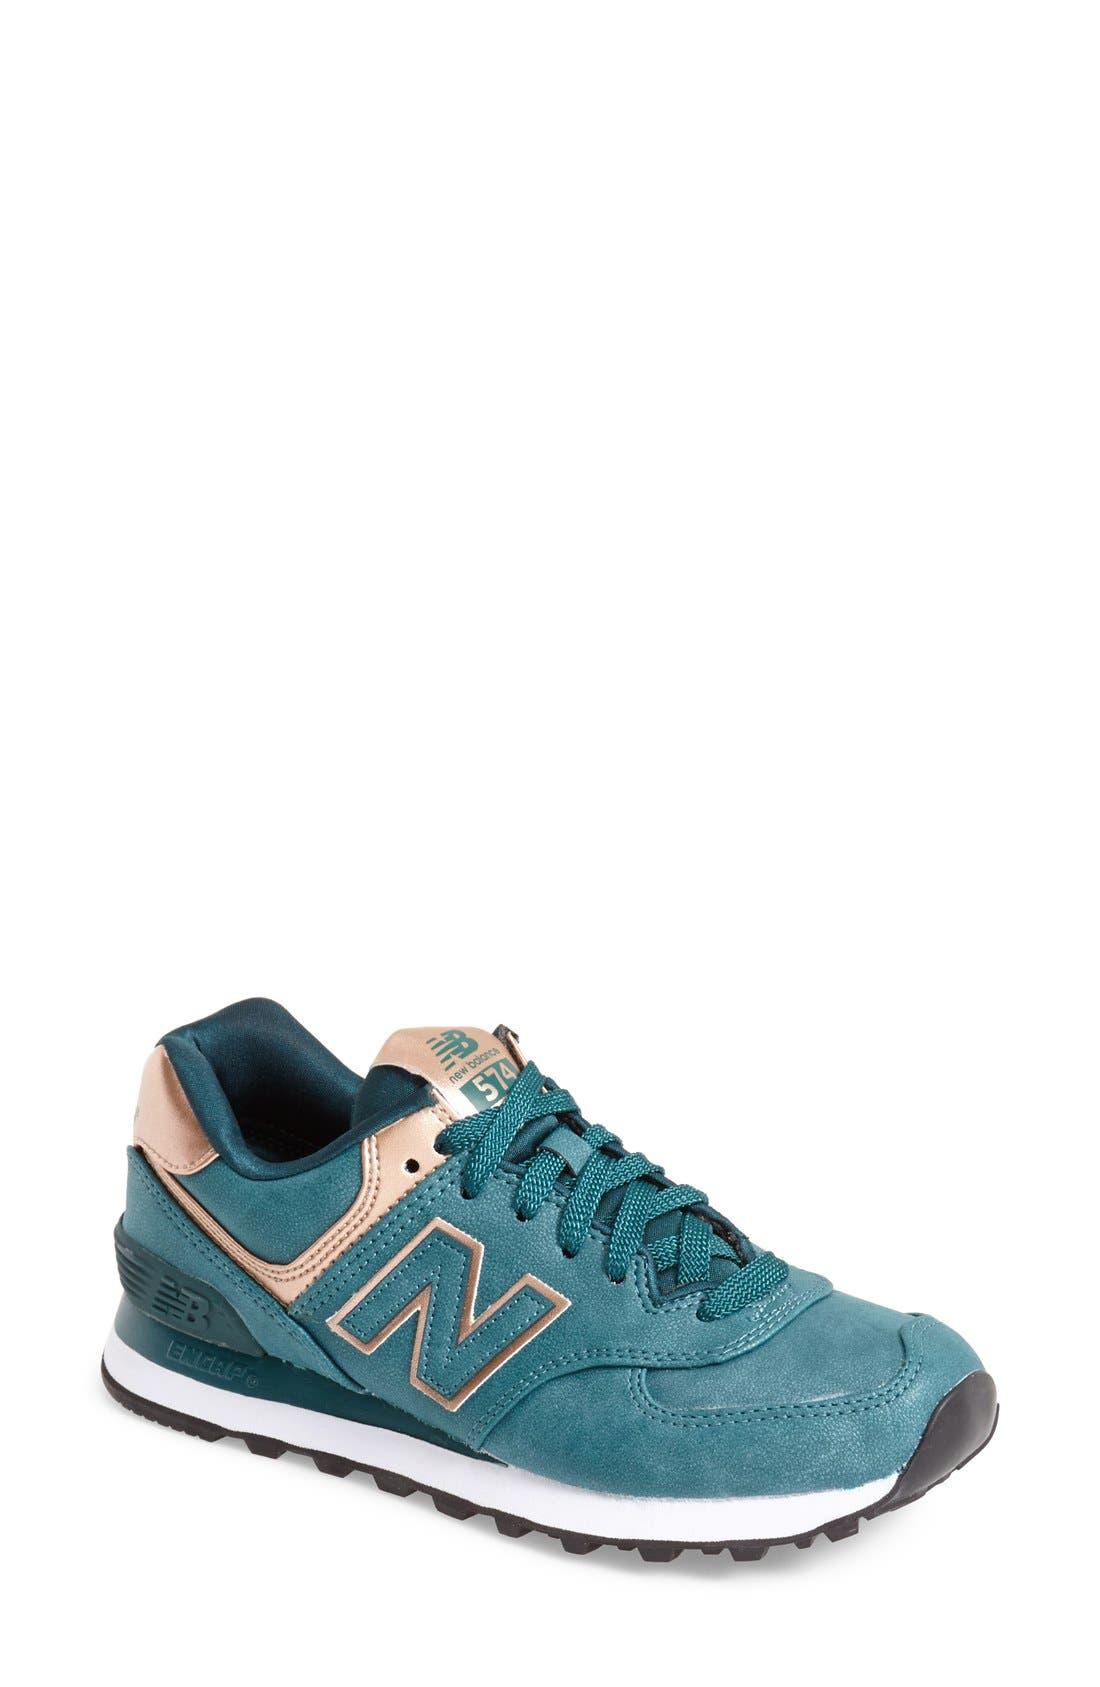 Main Image - New Balance '574 - Precious Metals' Sneaker (Women)